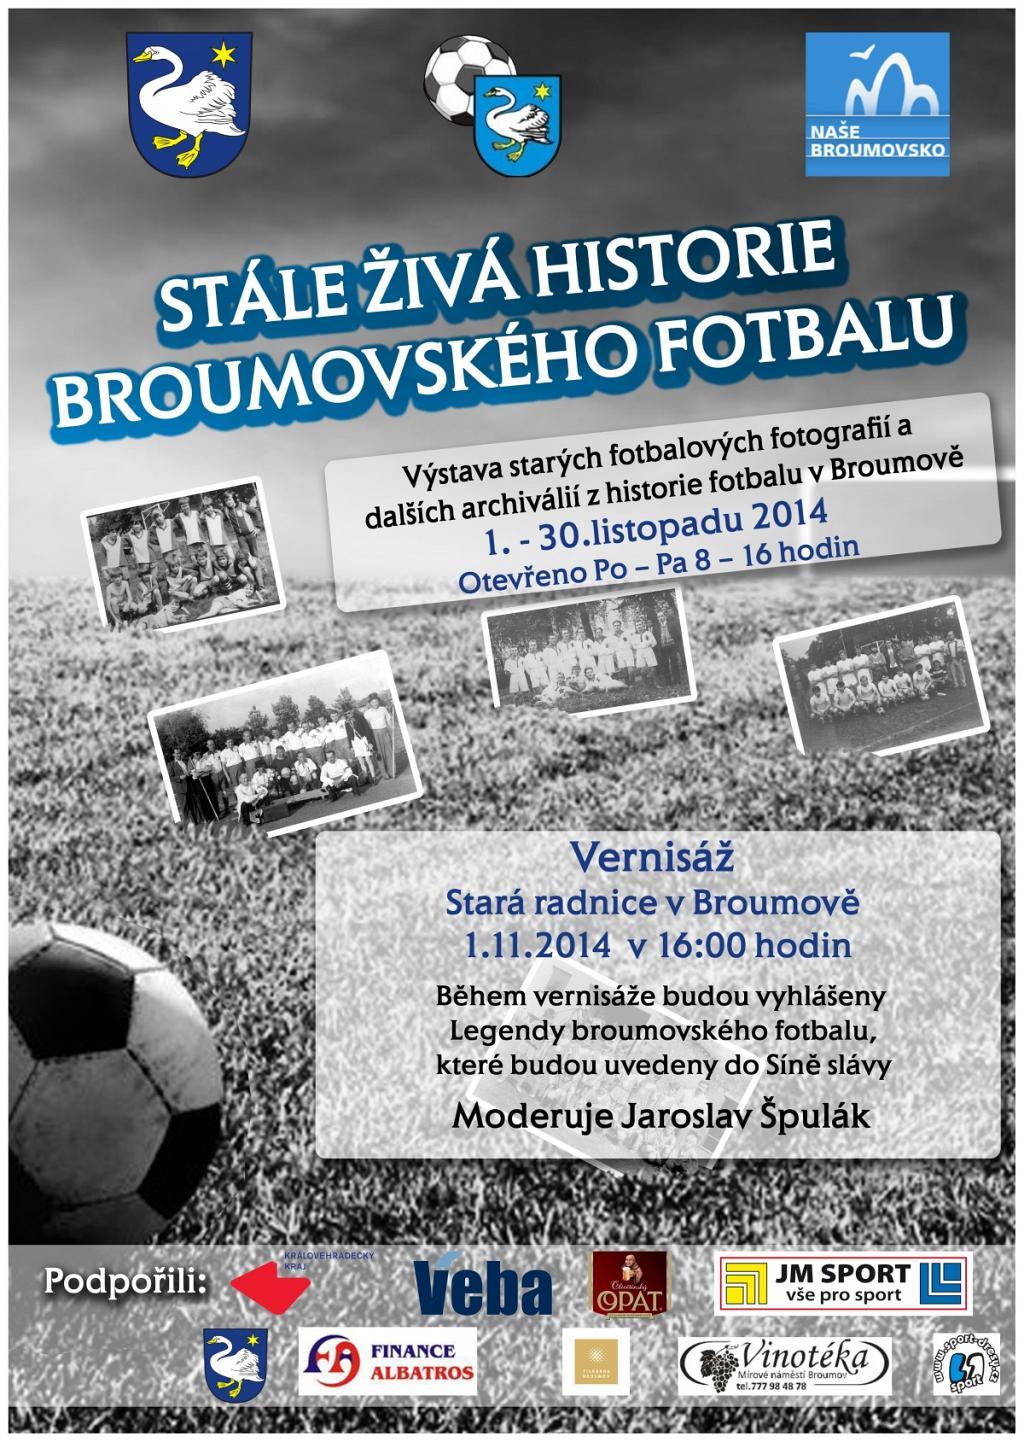 Stále živá historie broumovského fotbalu